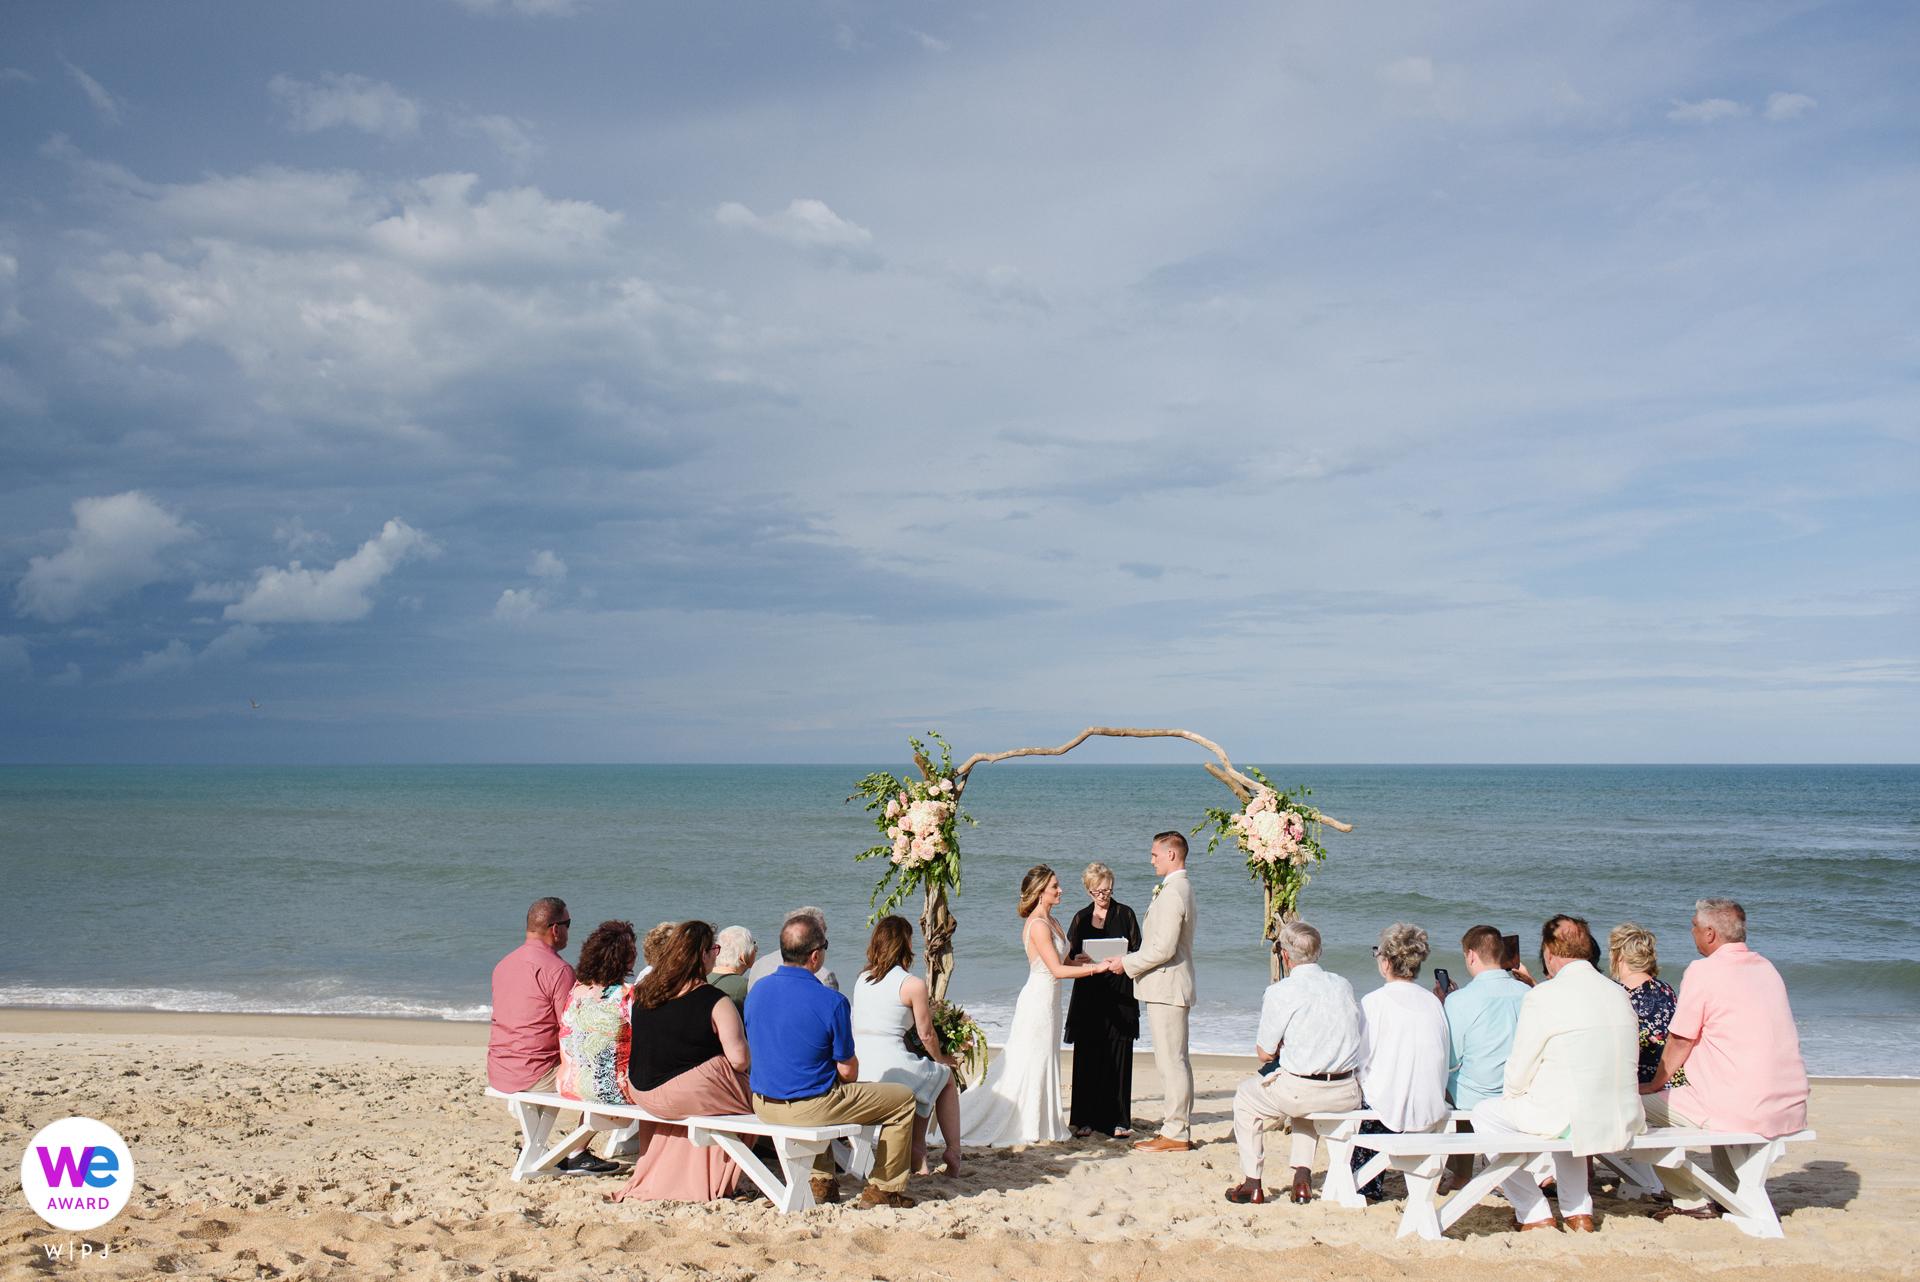 Poseidon Retreat, Corolla, North Carolina Elopement Photo | Small wedding ceremony on the beach